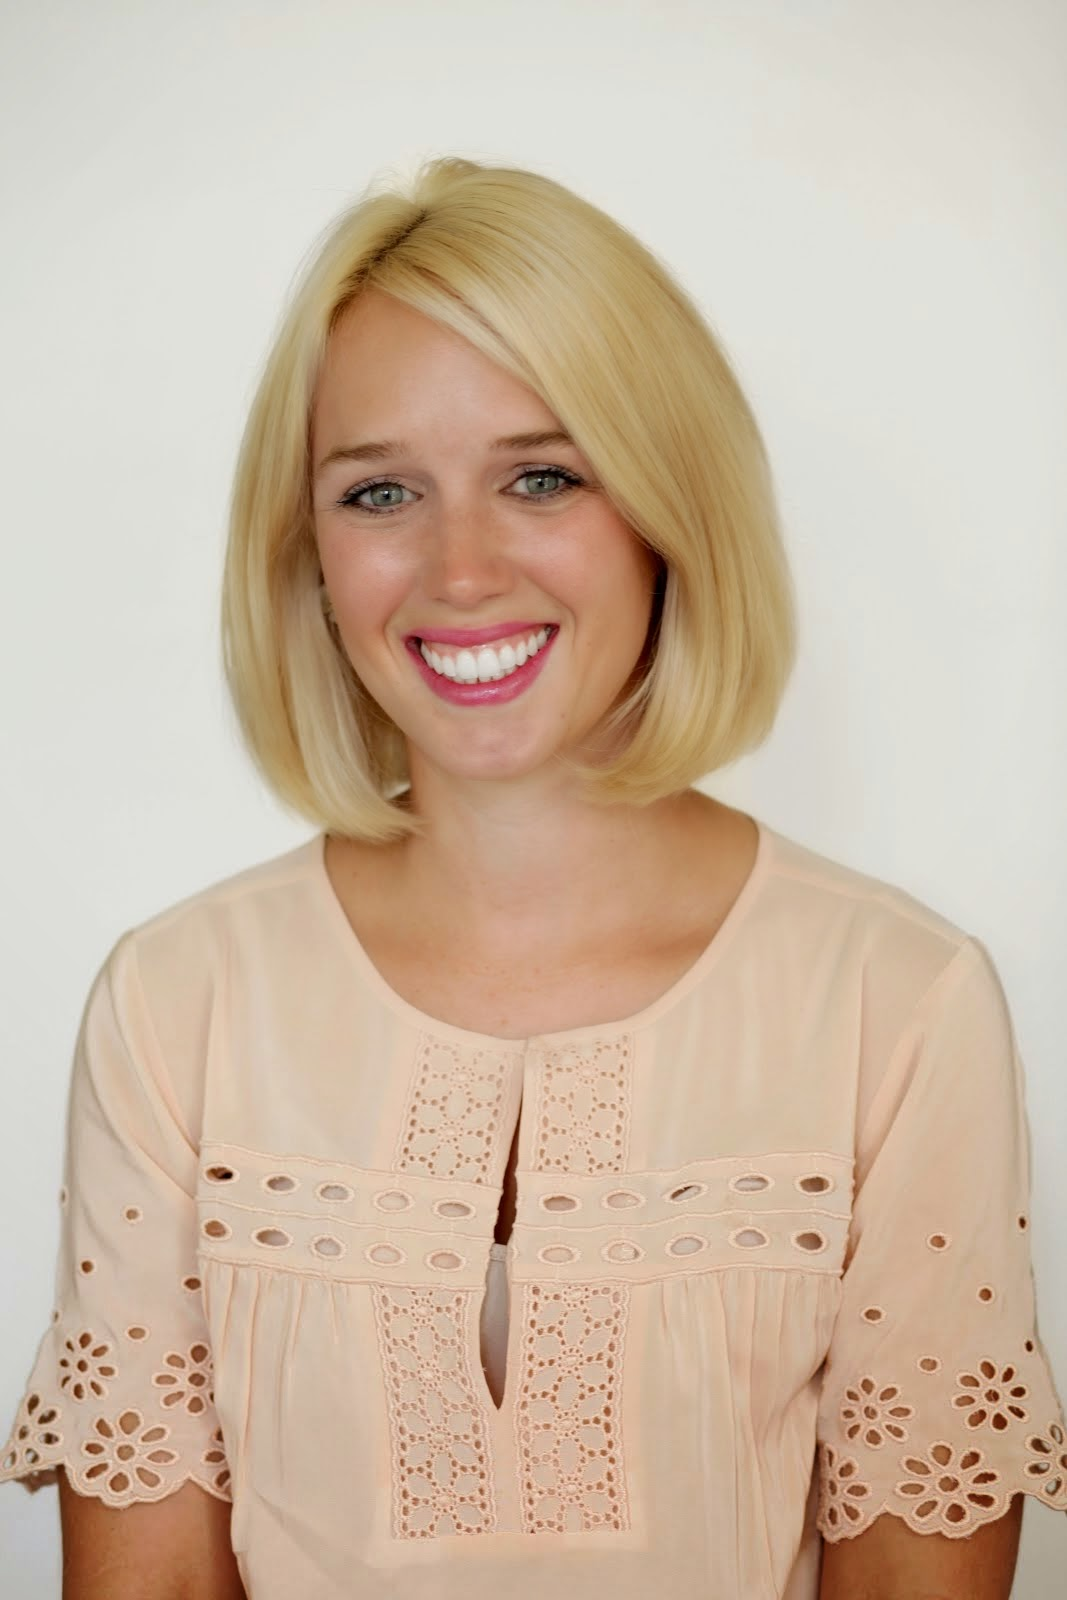 Jessica Williamson